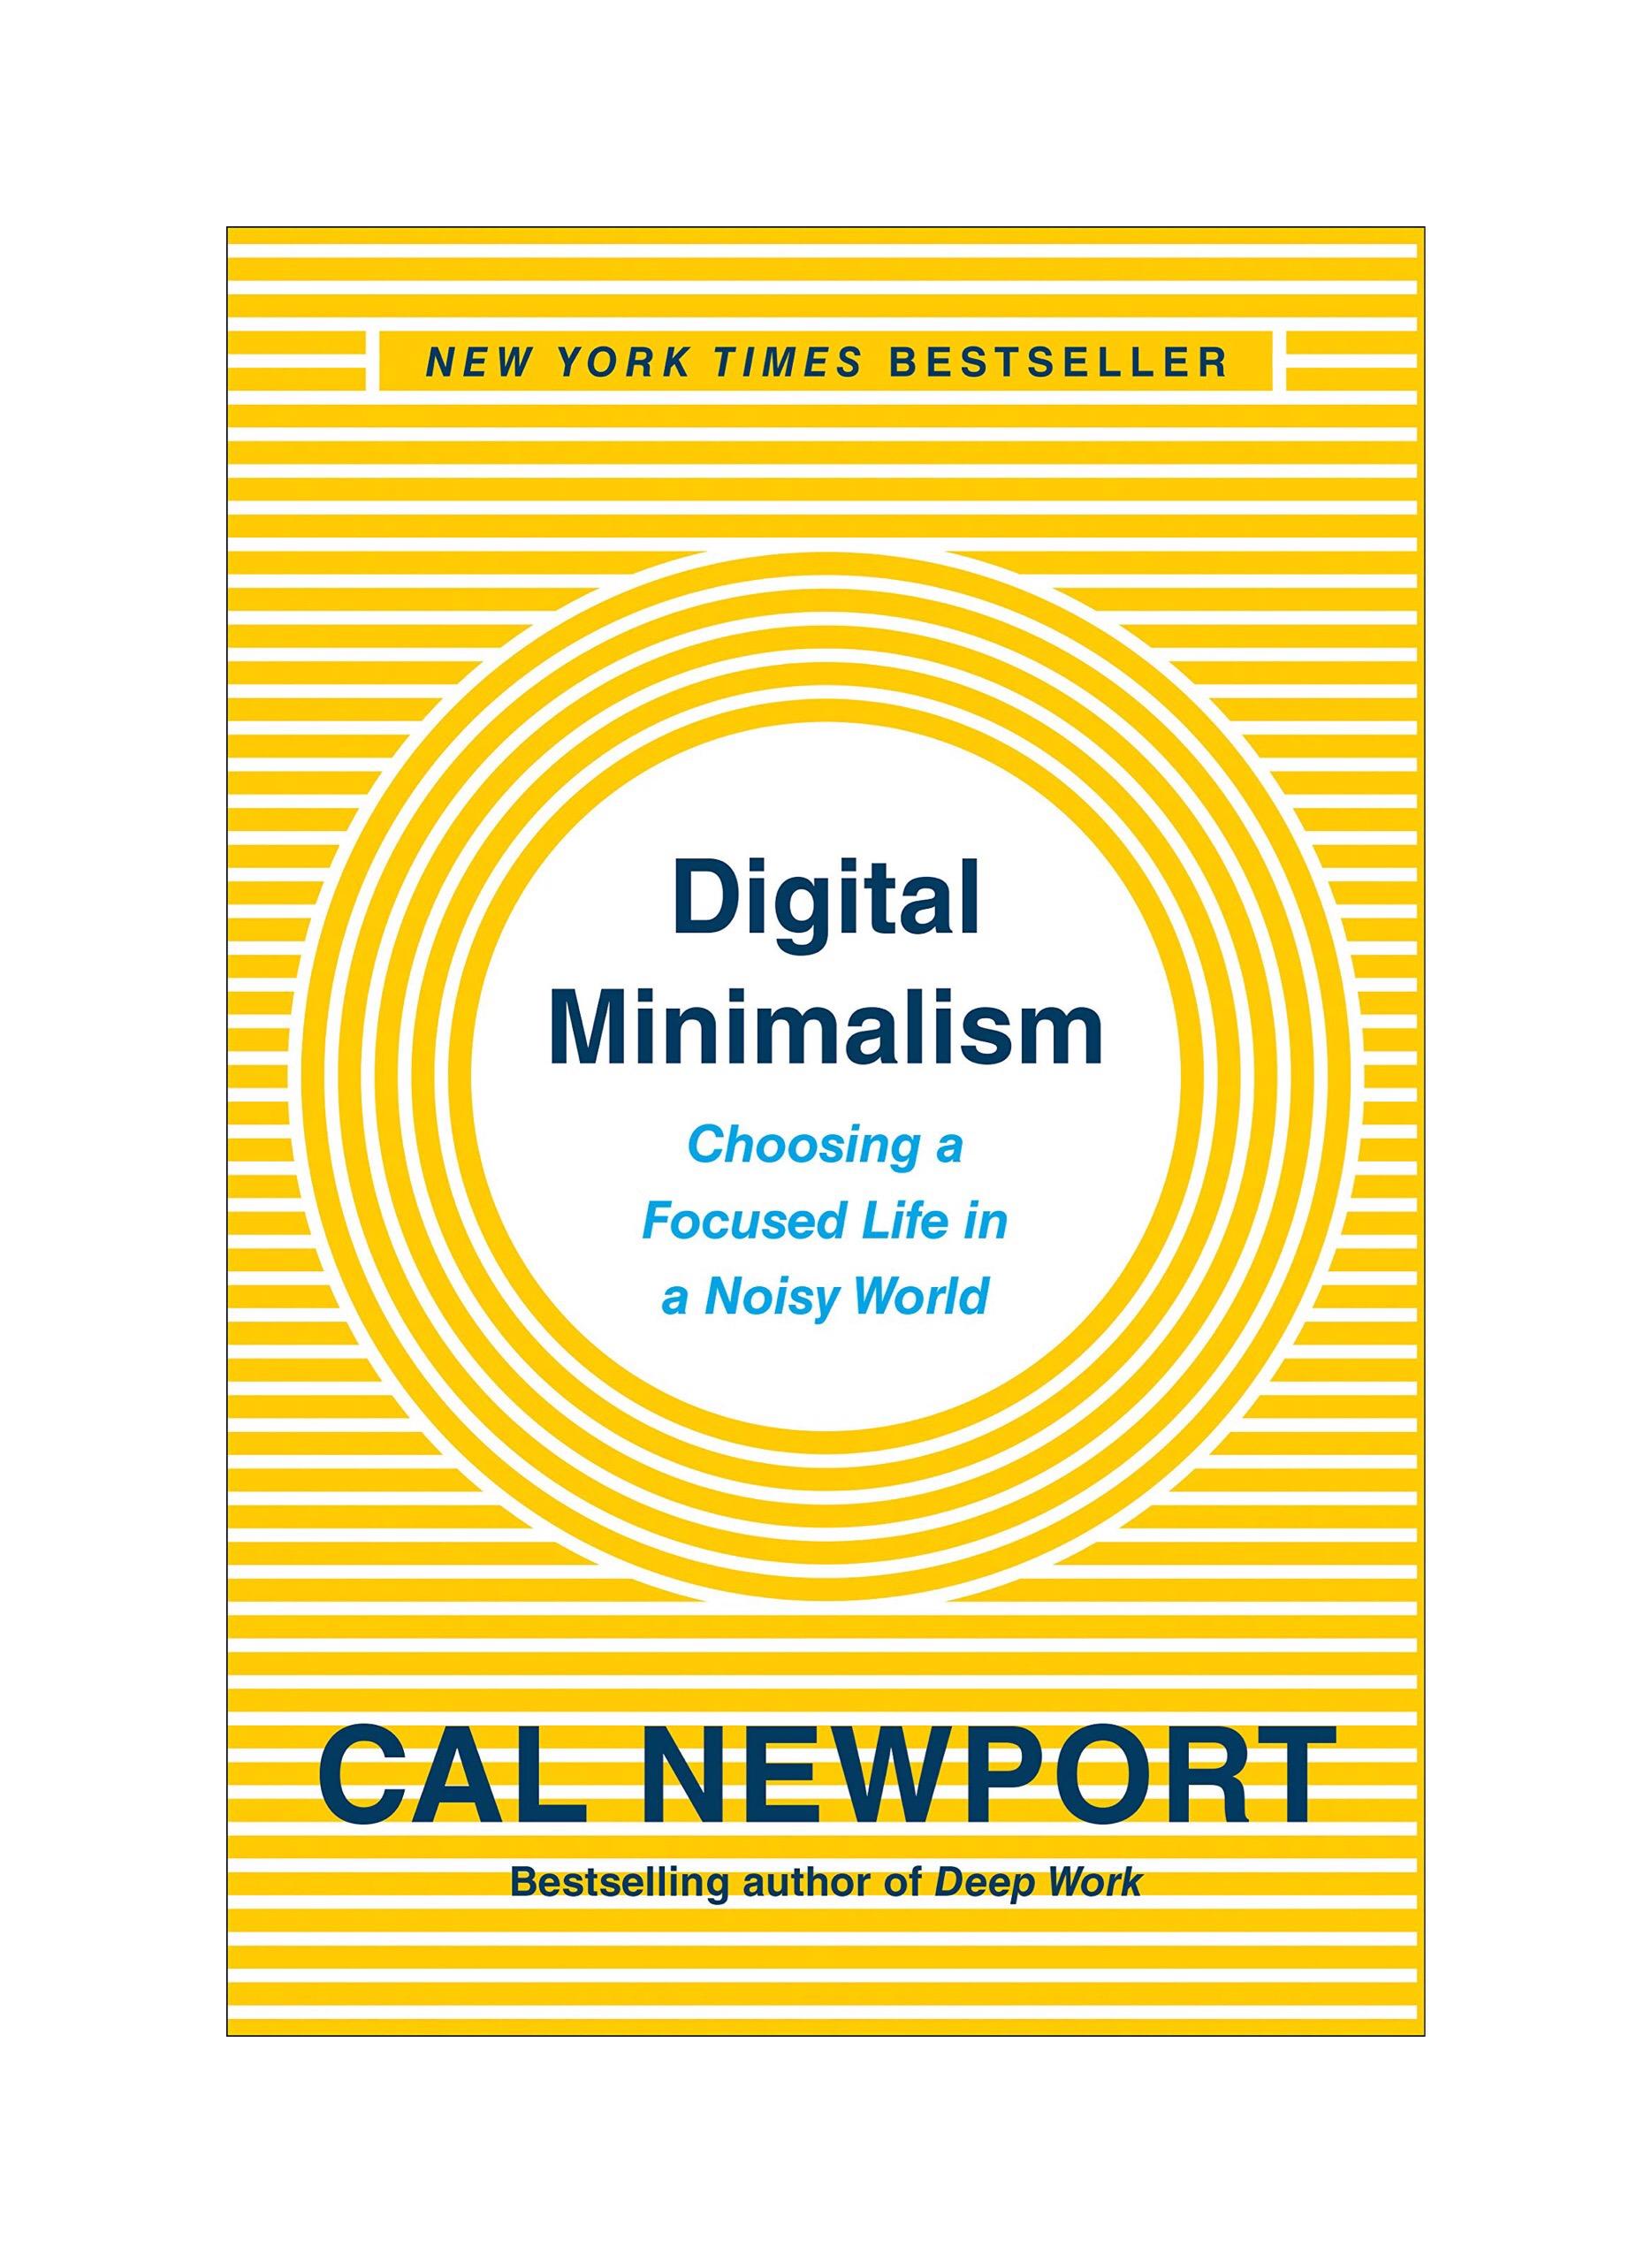 DigitalMinimalism.JPG